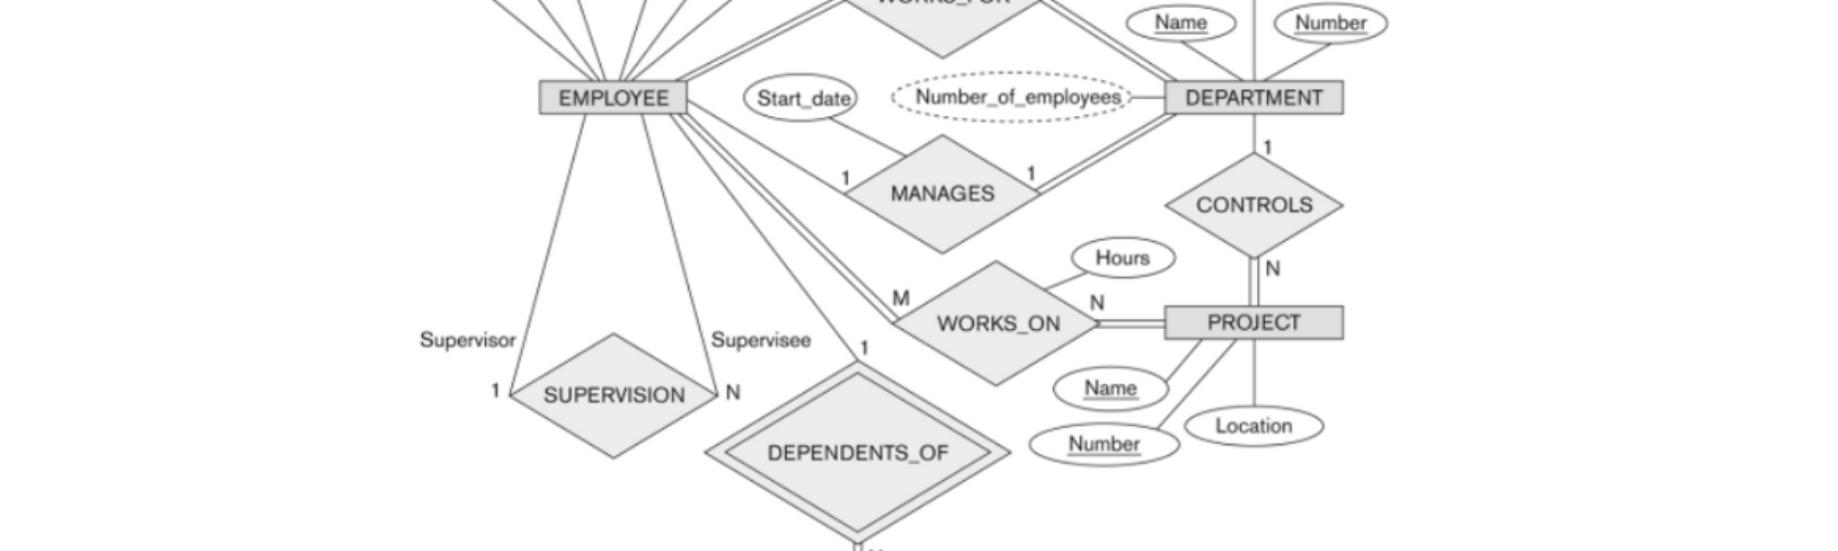 Database — Modeling : Entity Relationship Diagram (Erd) (Part 5) throughout Er Diagram Partial Key